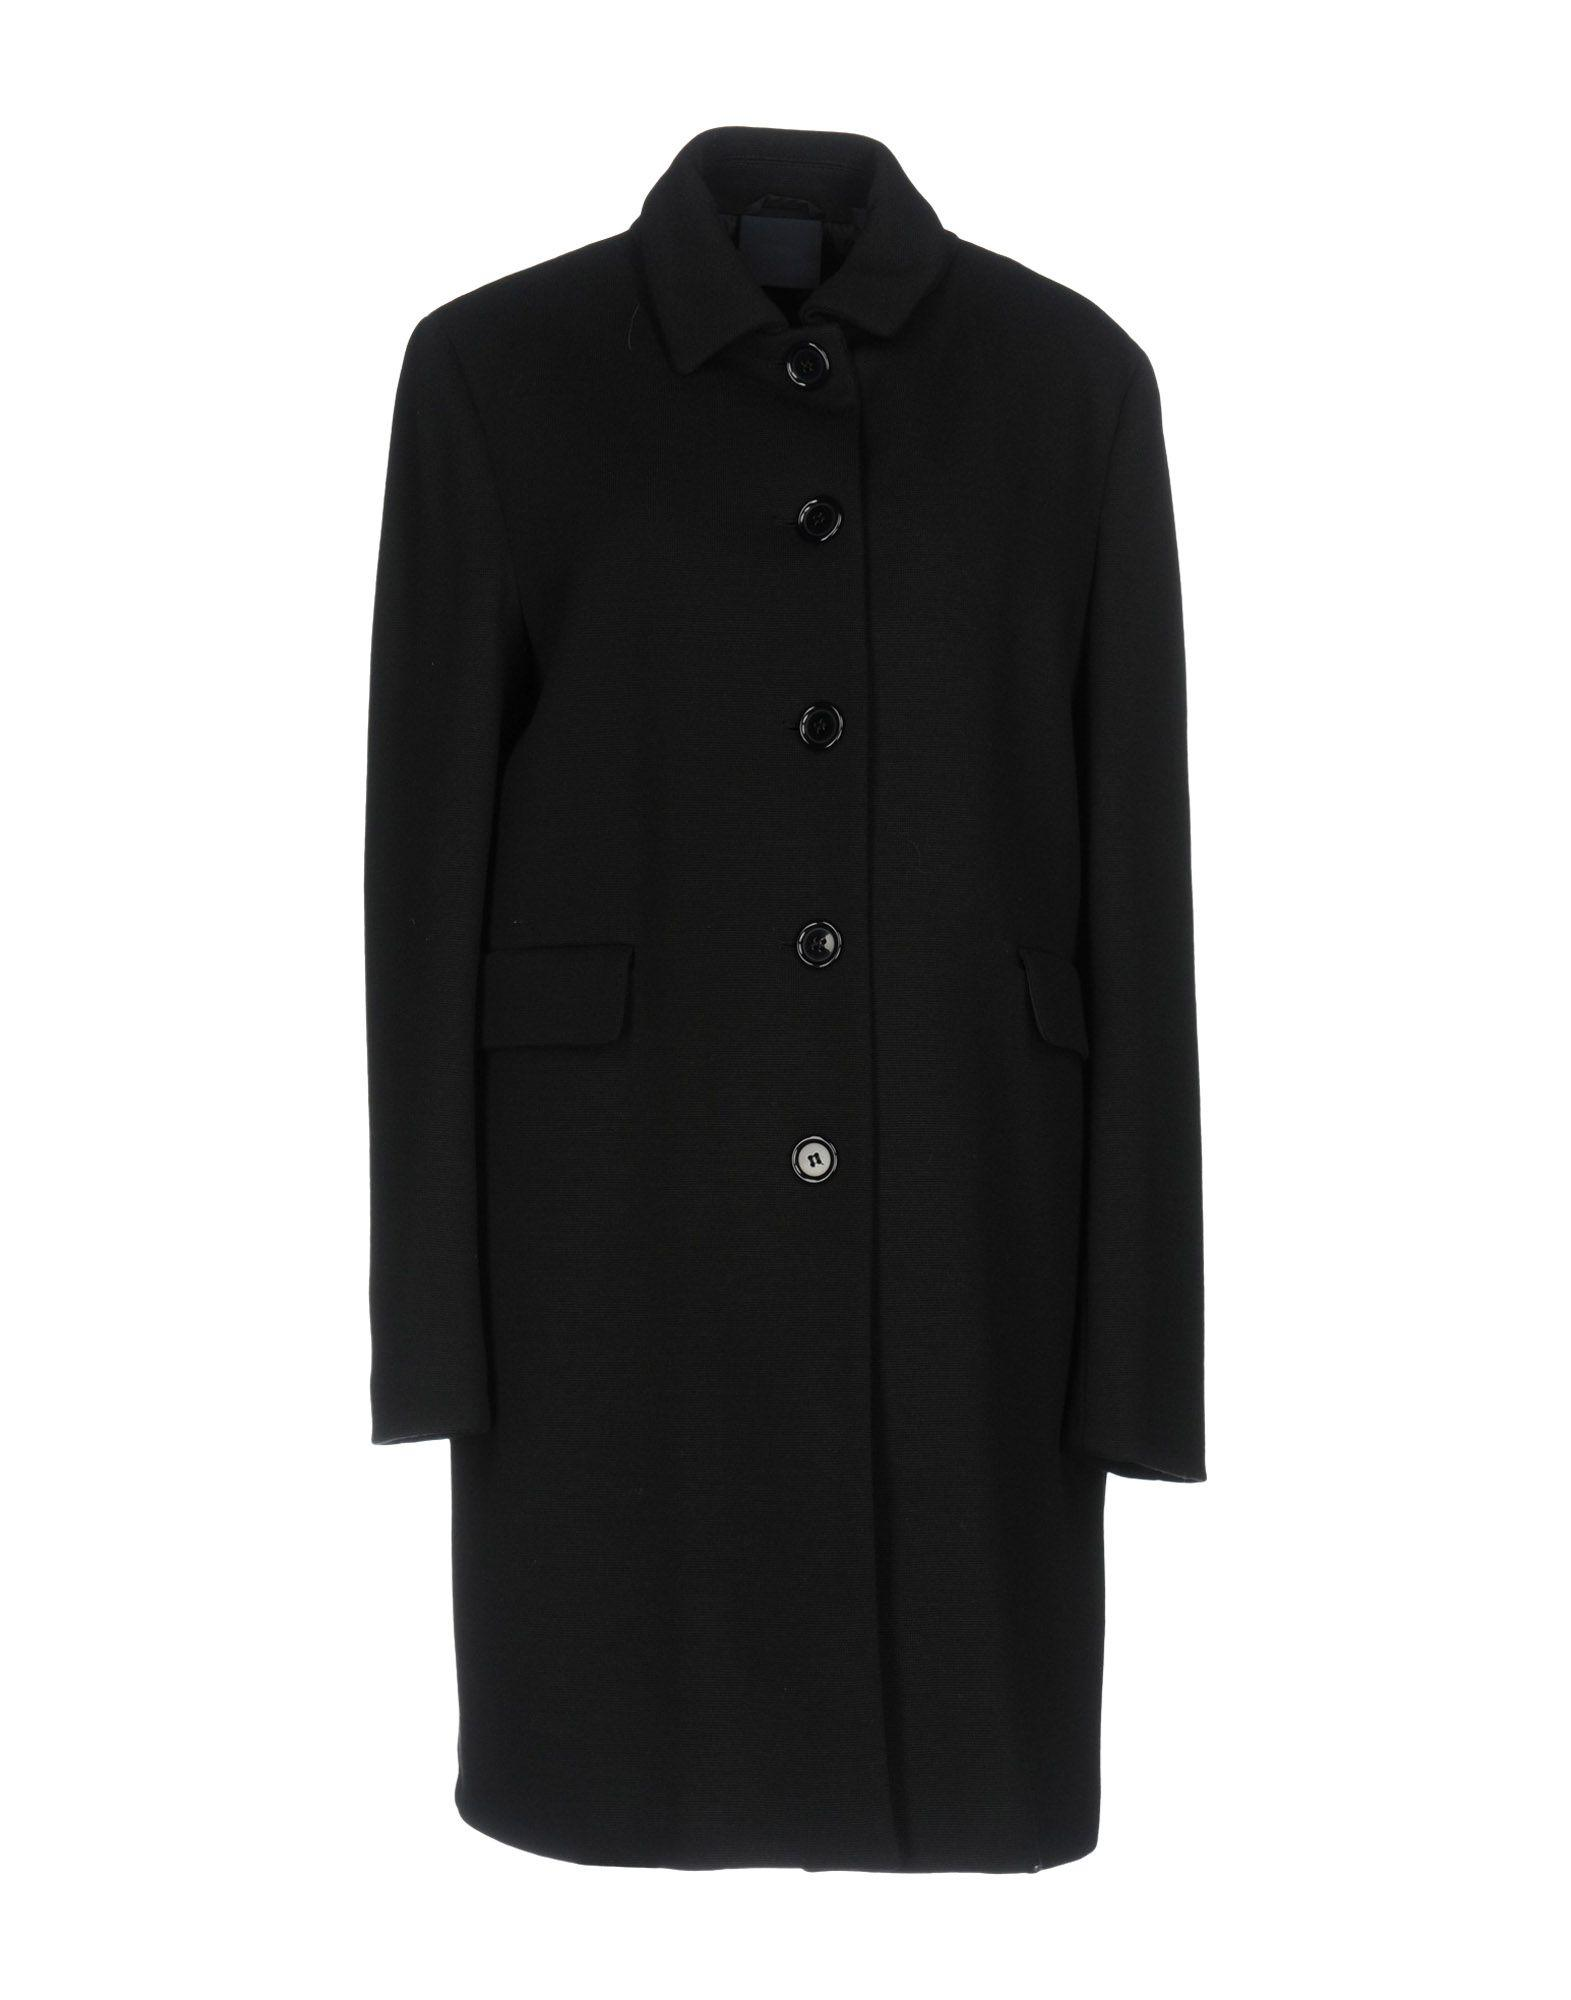 Aspesi Coats In Black